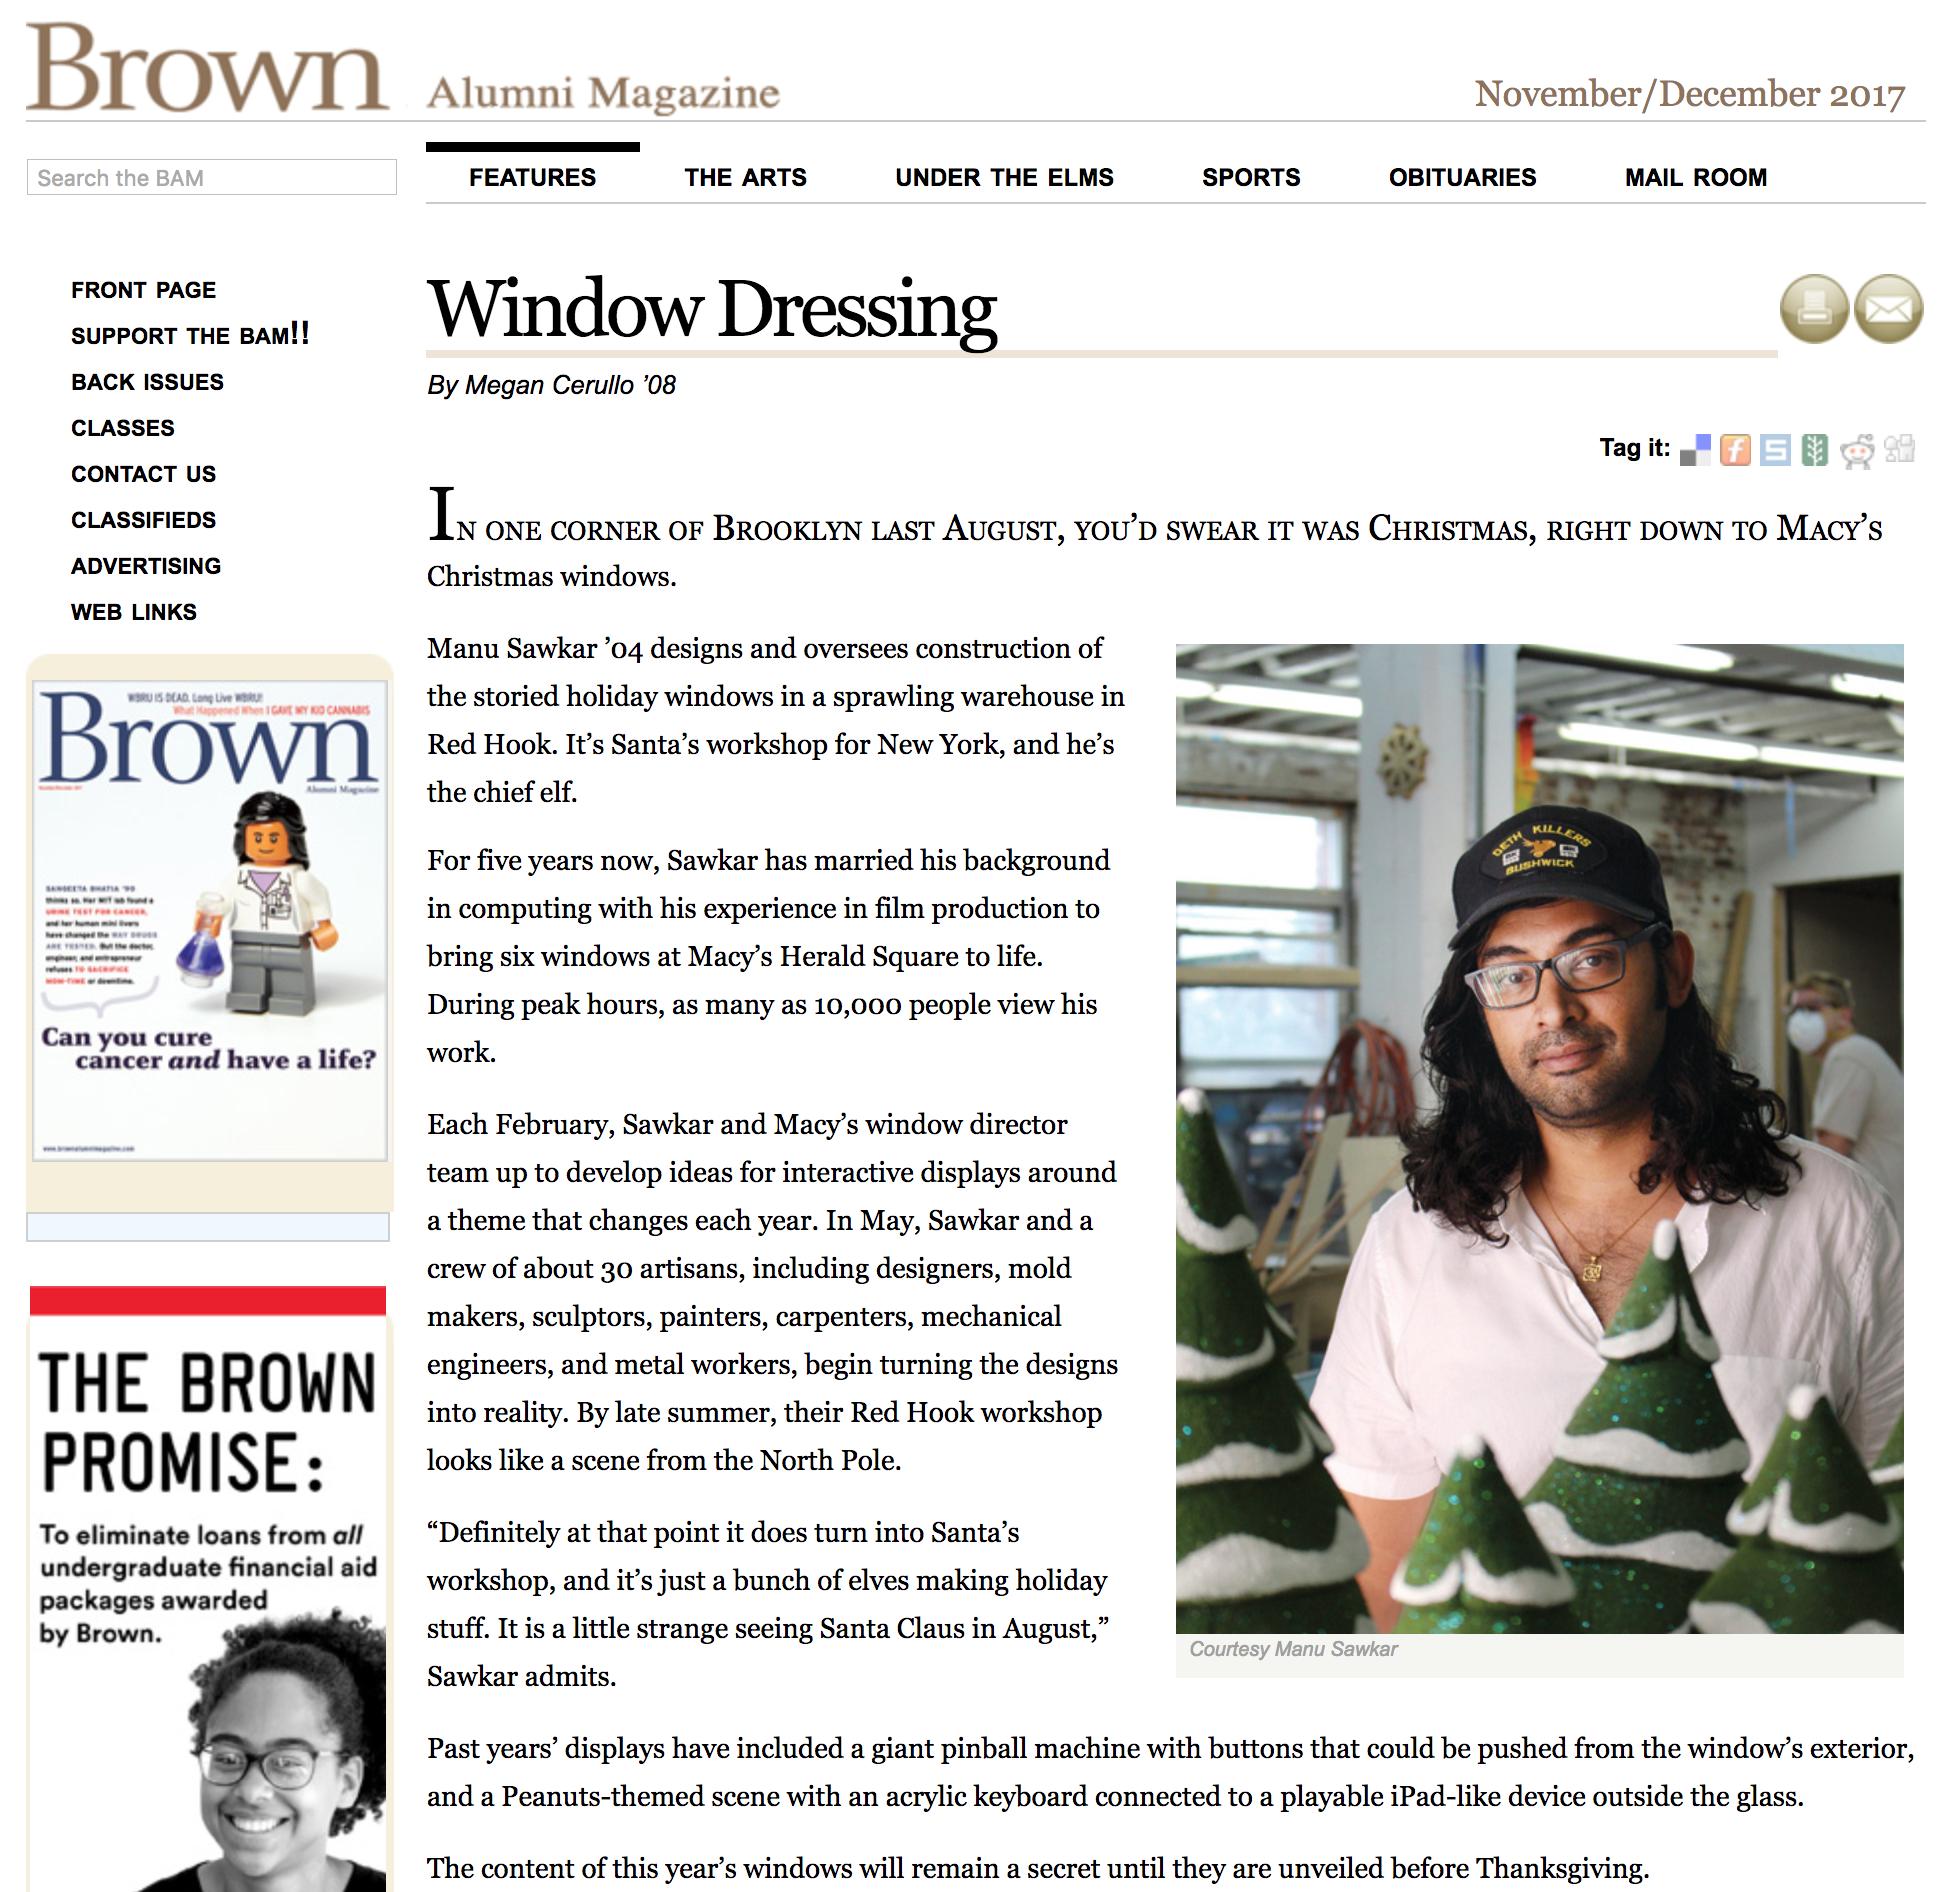 Brown University Alumni Magazine - Manu Sawkar:Feature Profile